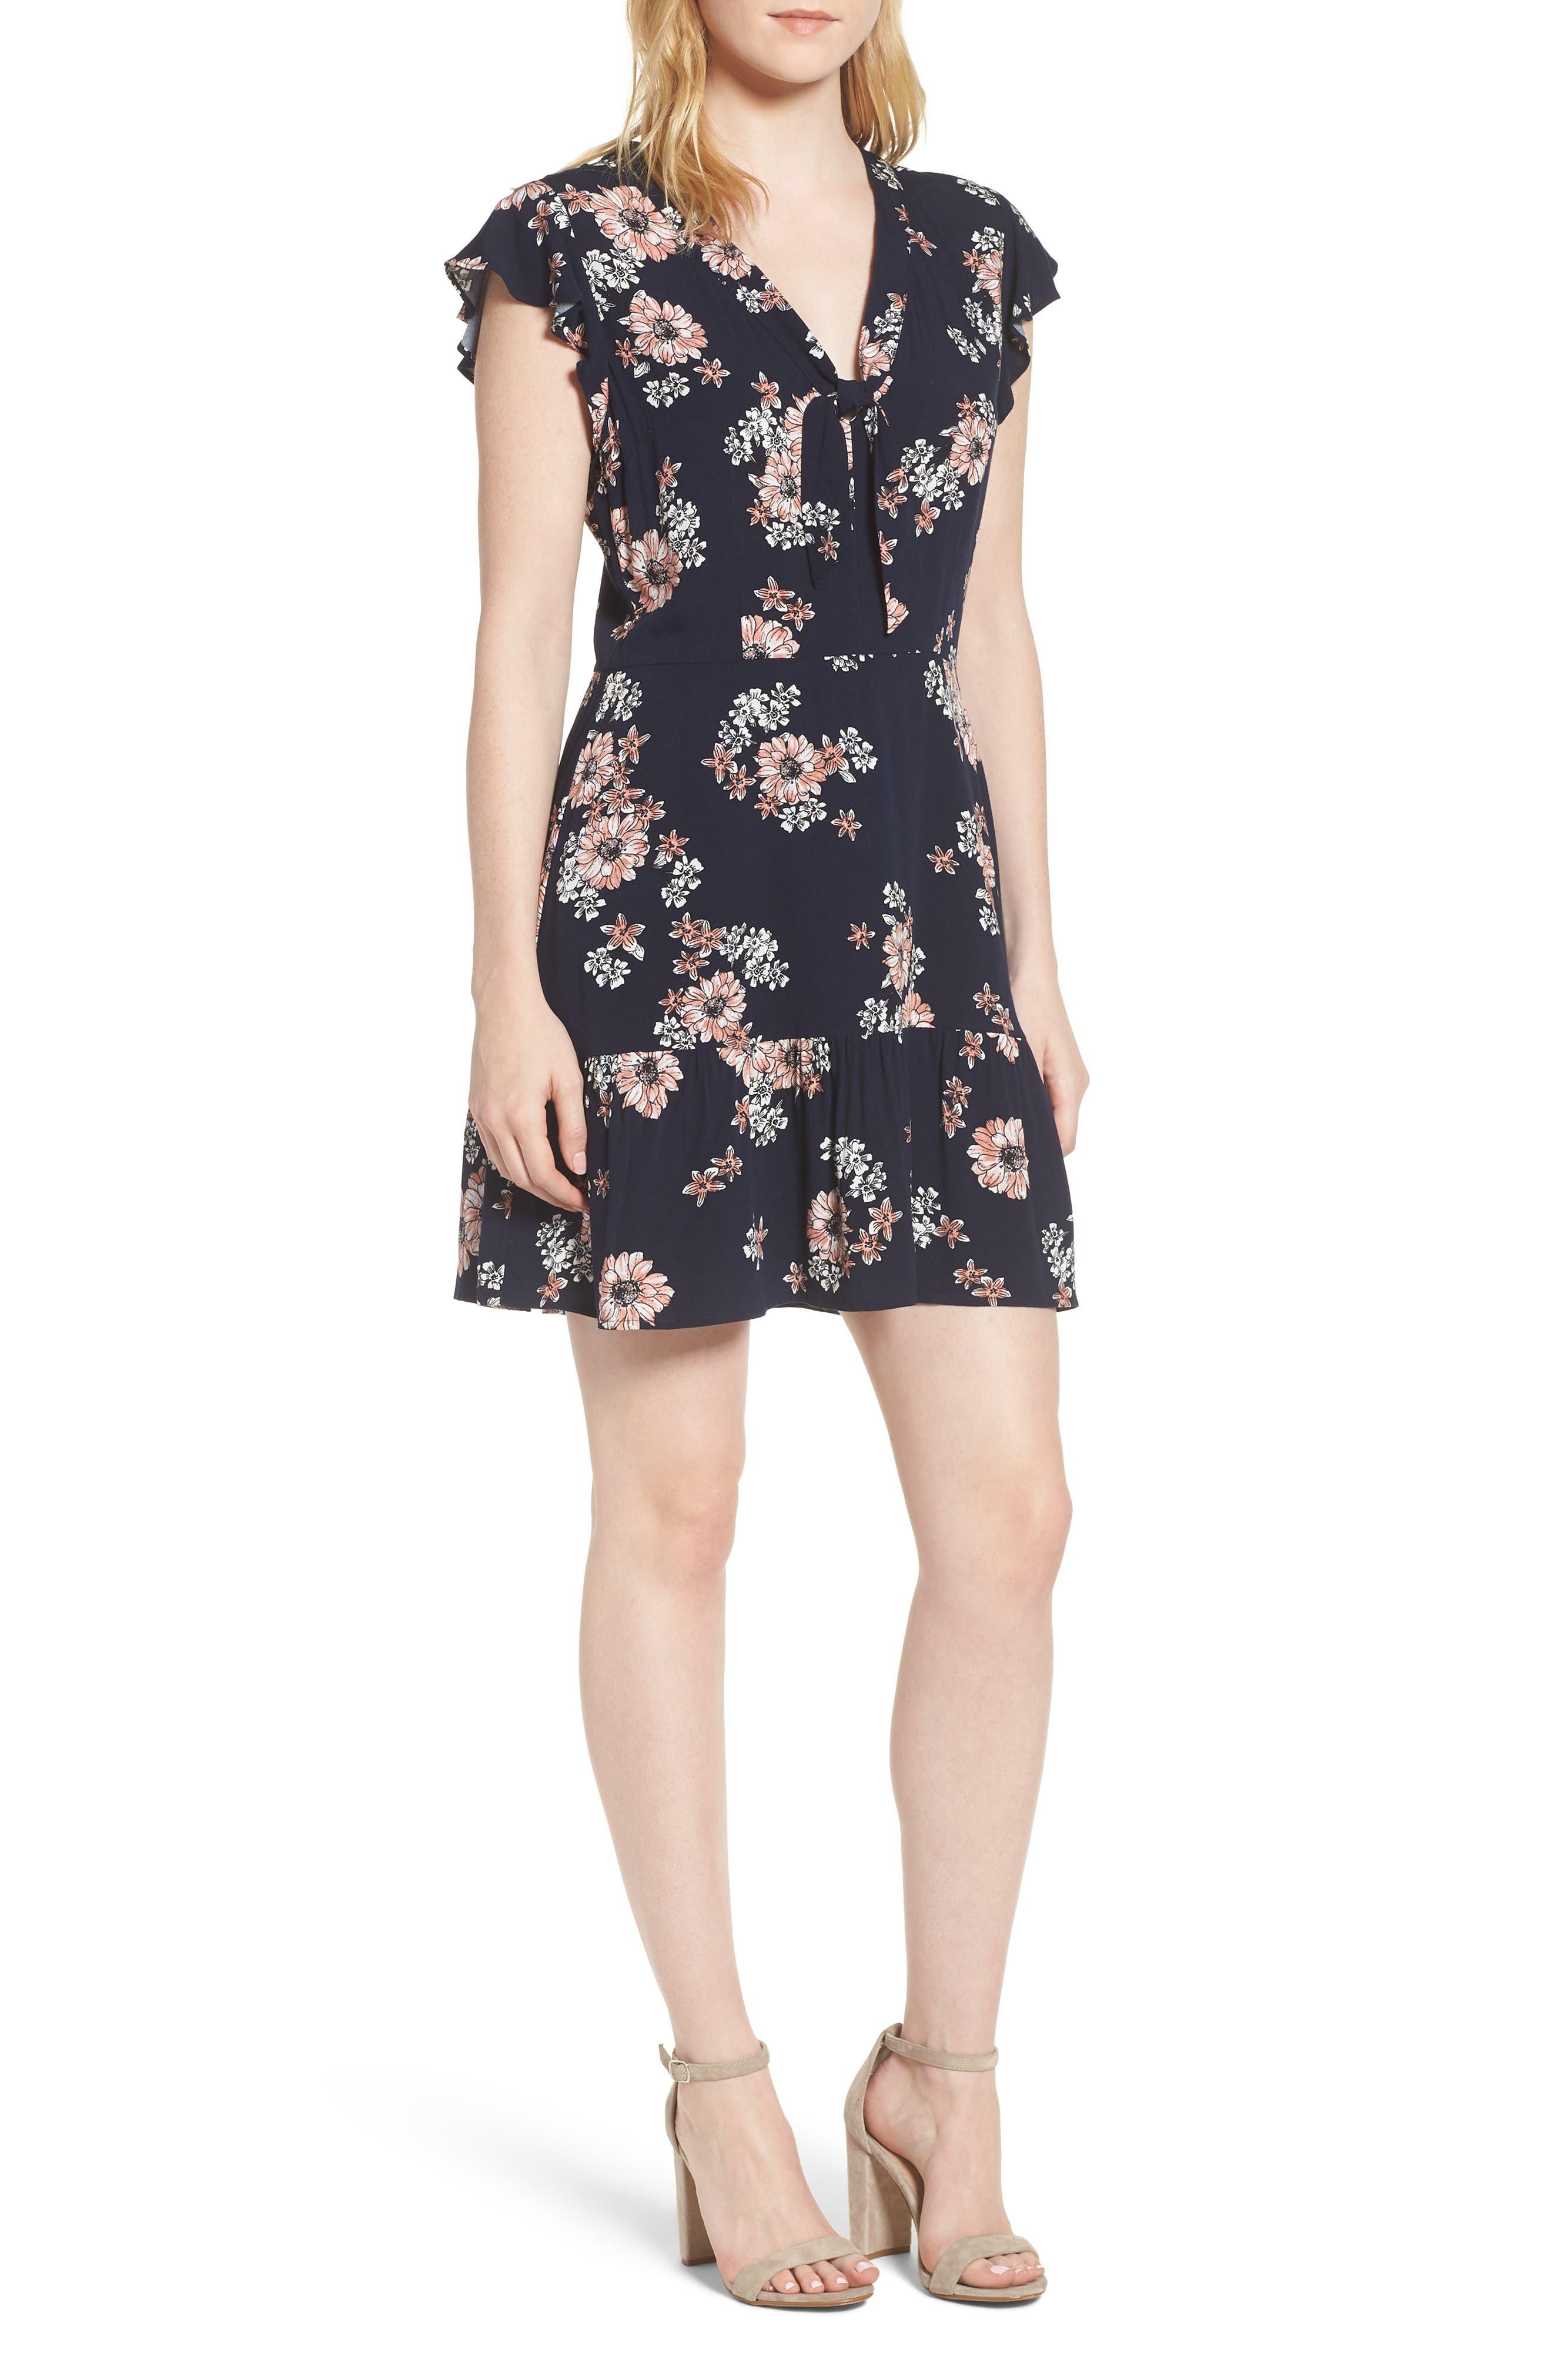 Dalma Floral Print Dress,                         Main,                         color,